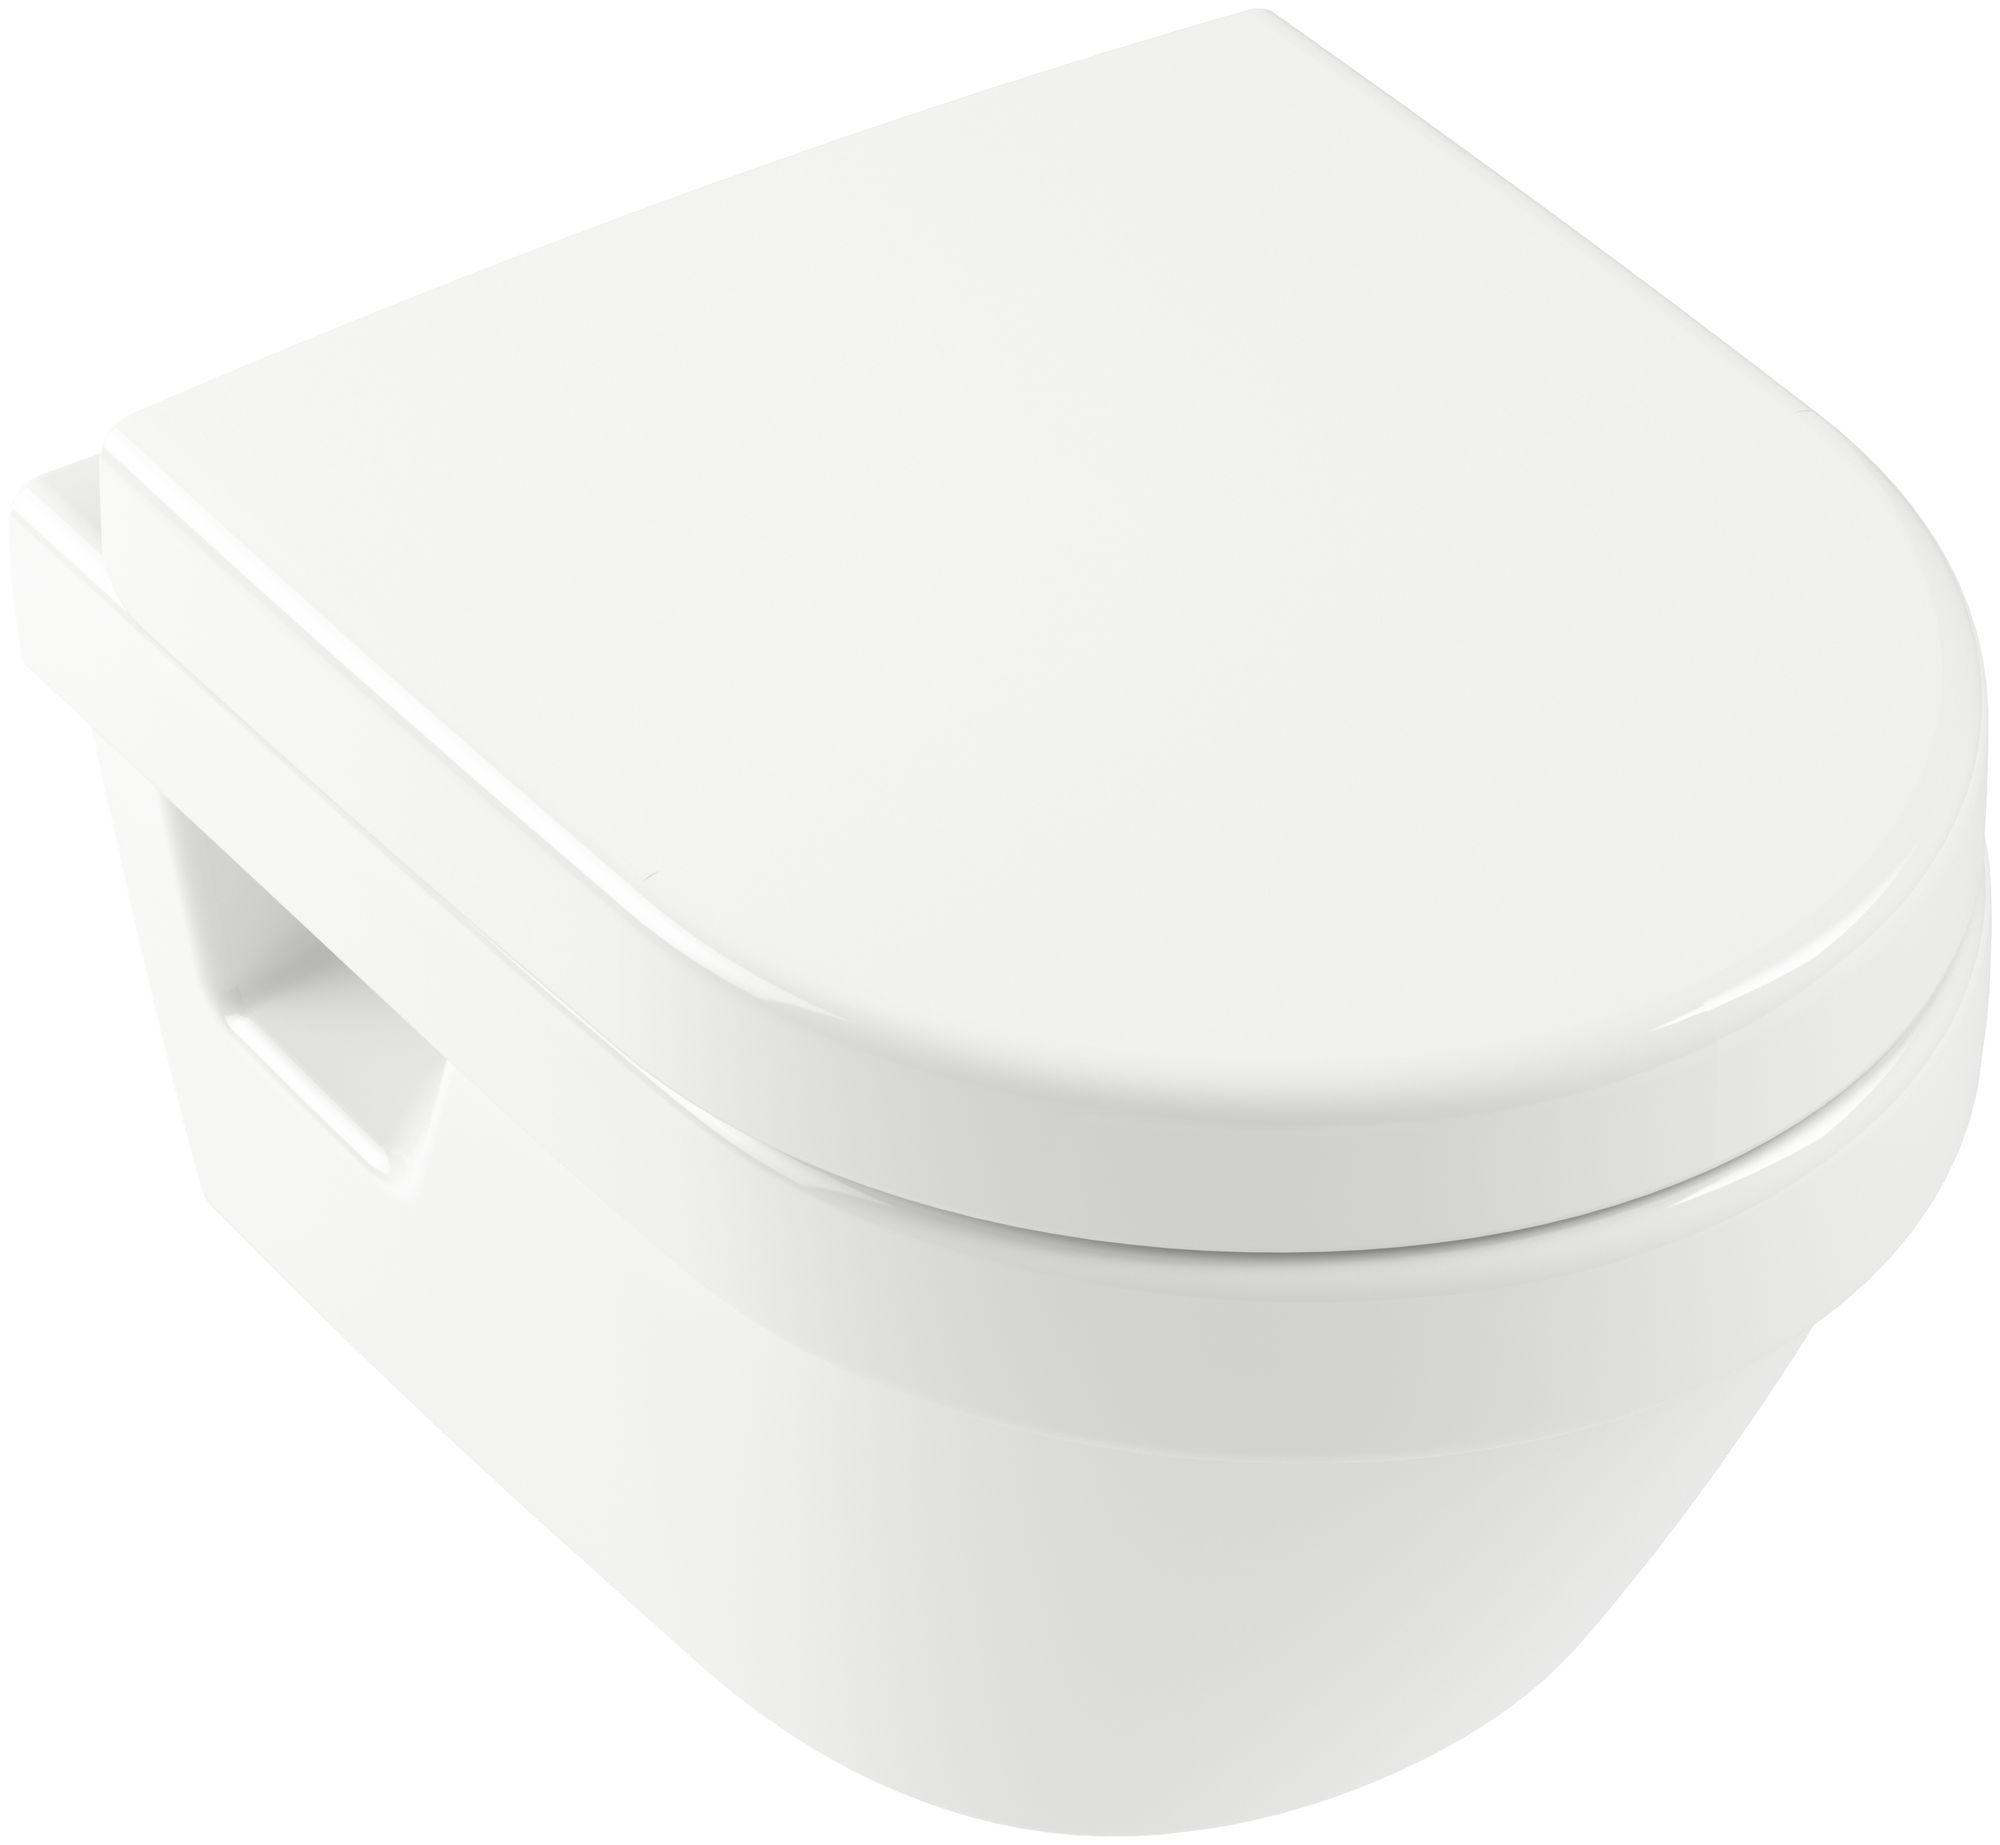 Villeroy & Boch Architectura Wand-Tiefspül-WC Combi-Pack L:48 B:35cm DirectFlush mit offenem Spülrand weiß 4687HR01